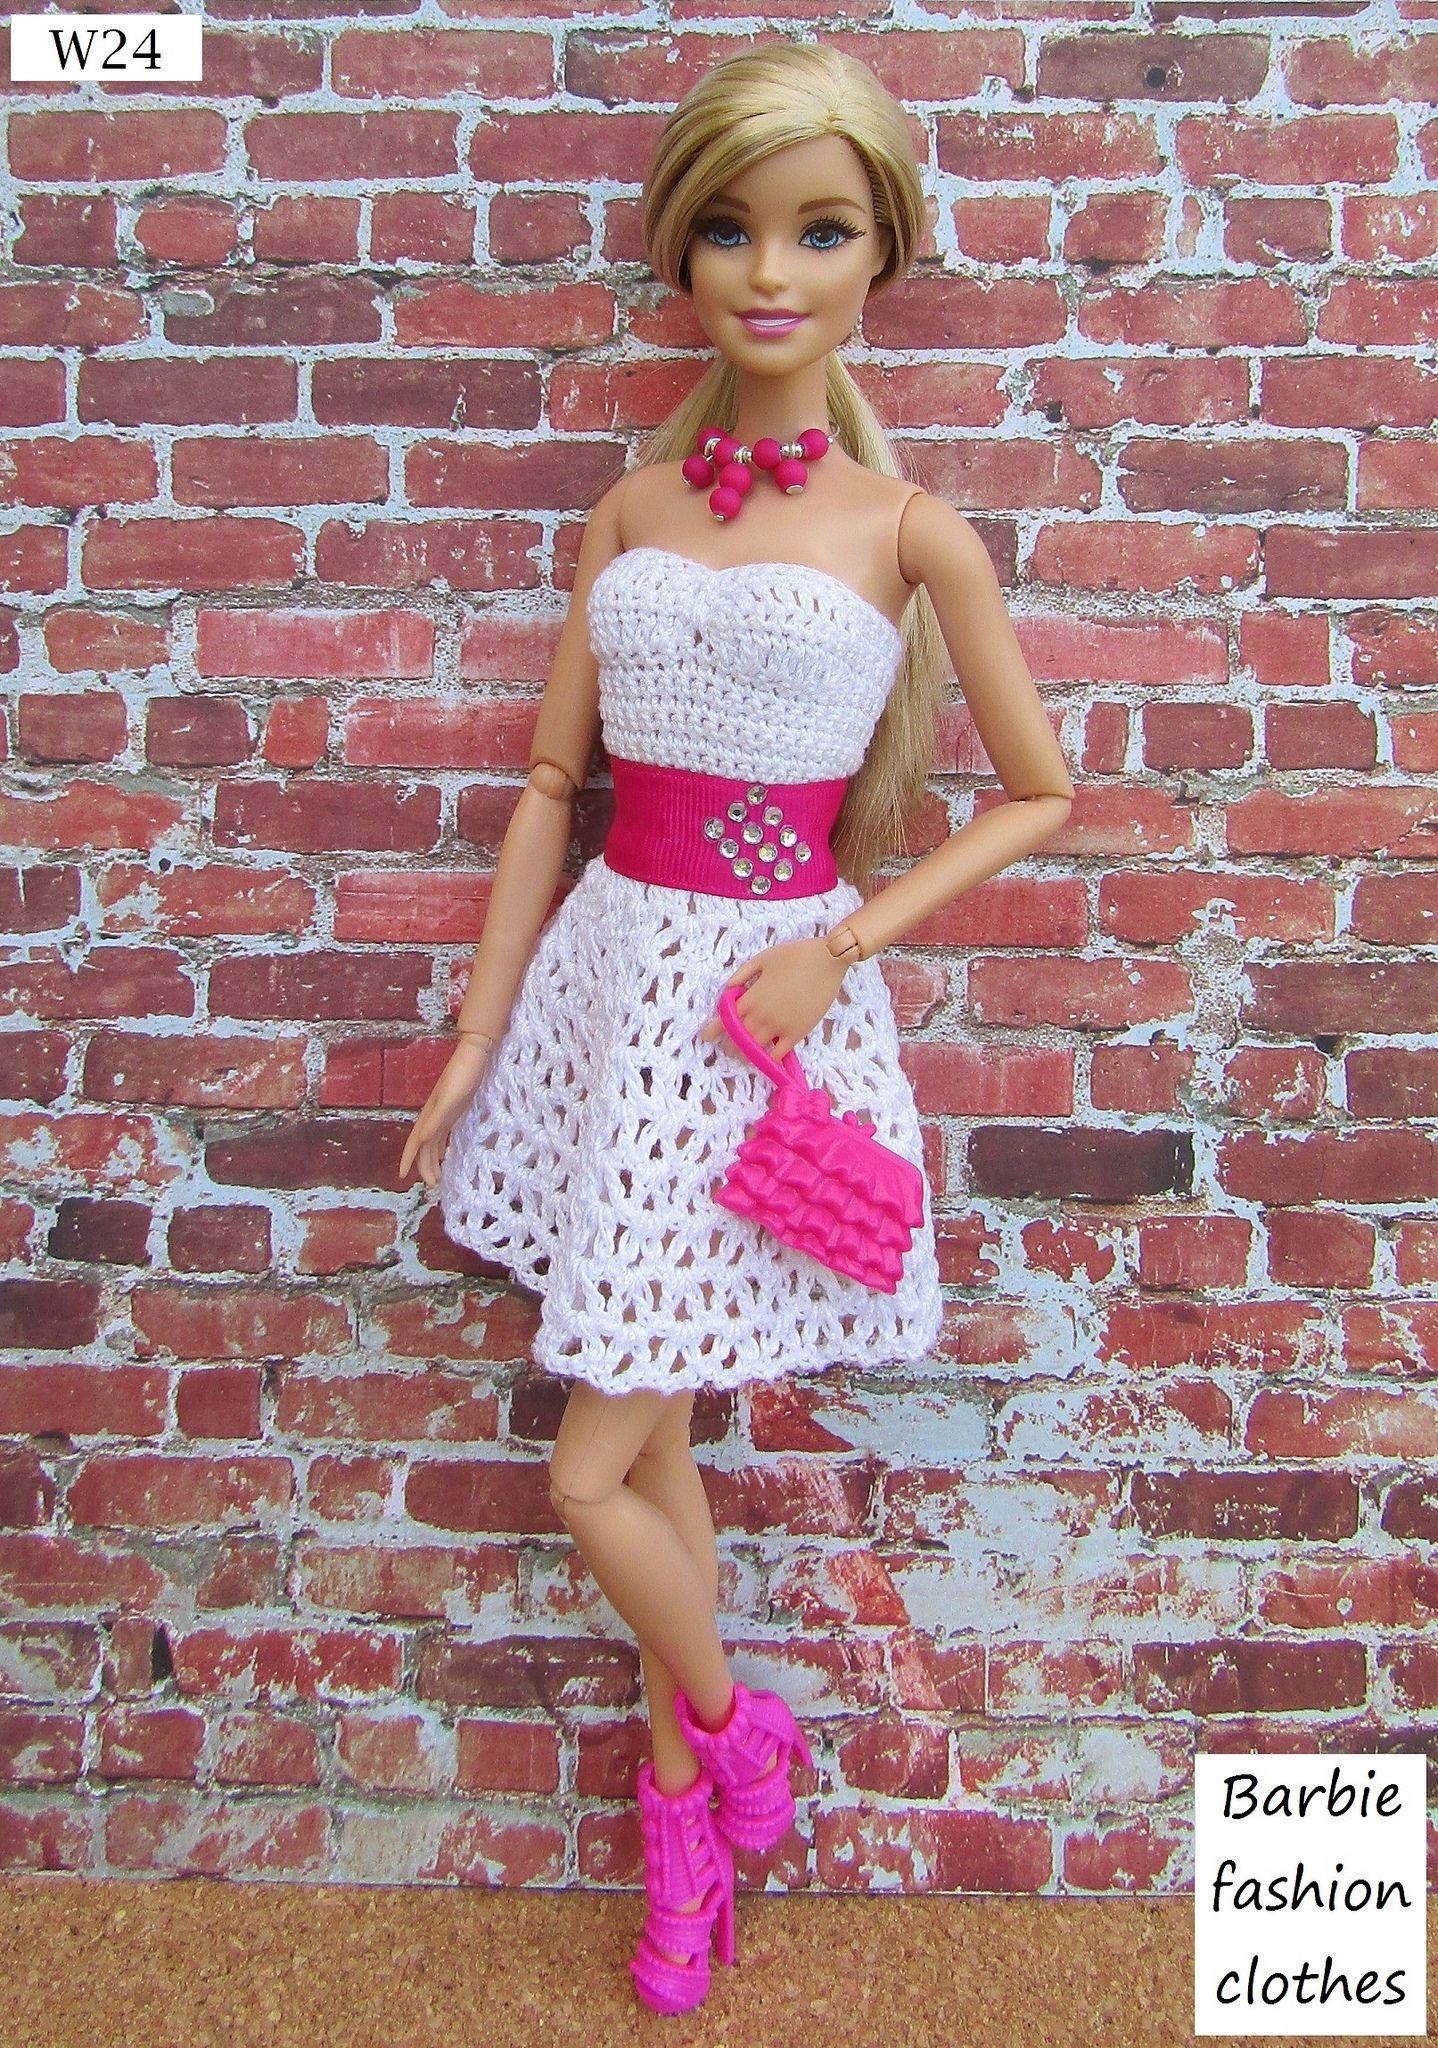 Pin von Anel Lombard auf Barbie fashion clothes   Pinterest ...